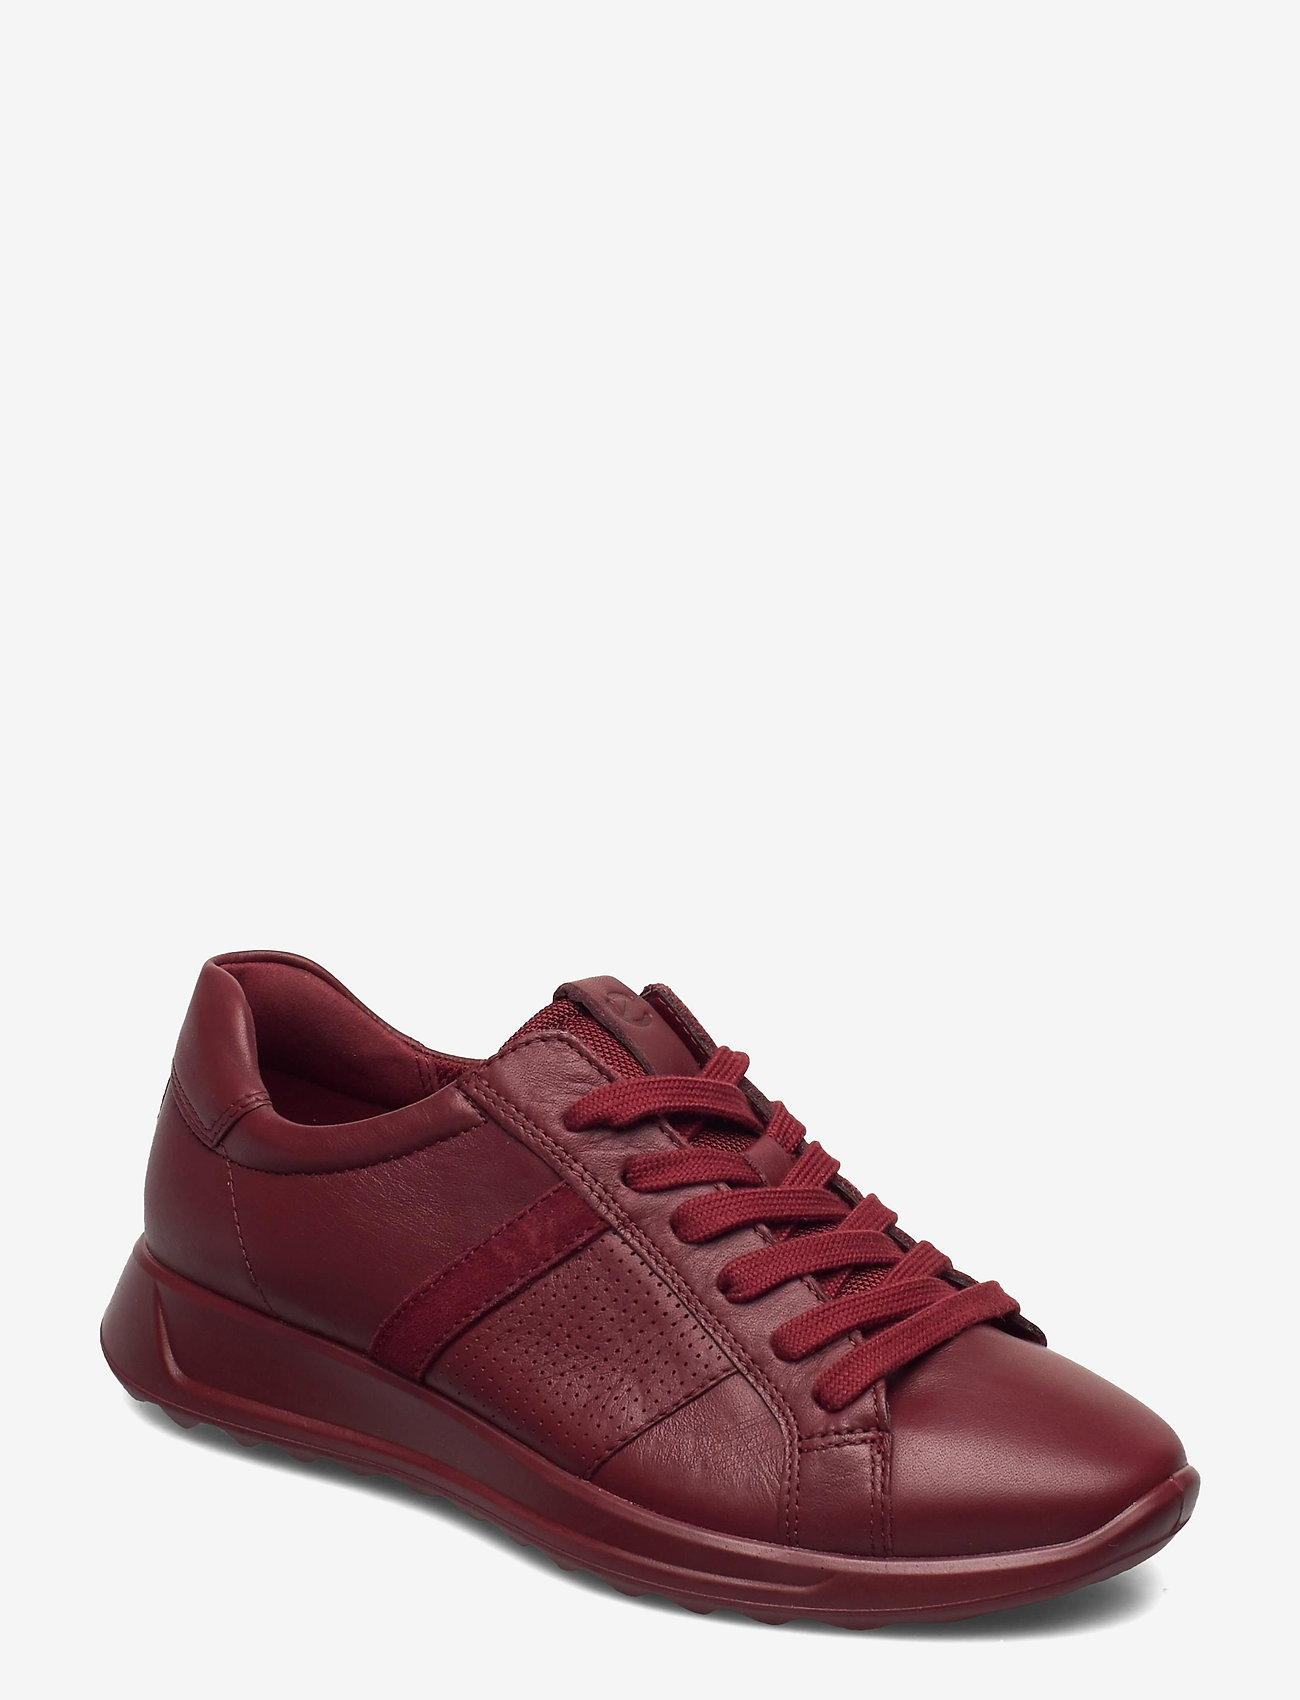 ECCO - FLEXURE RUNNER W - lage sneakers - syrah/syrah - 0